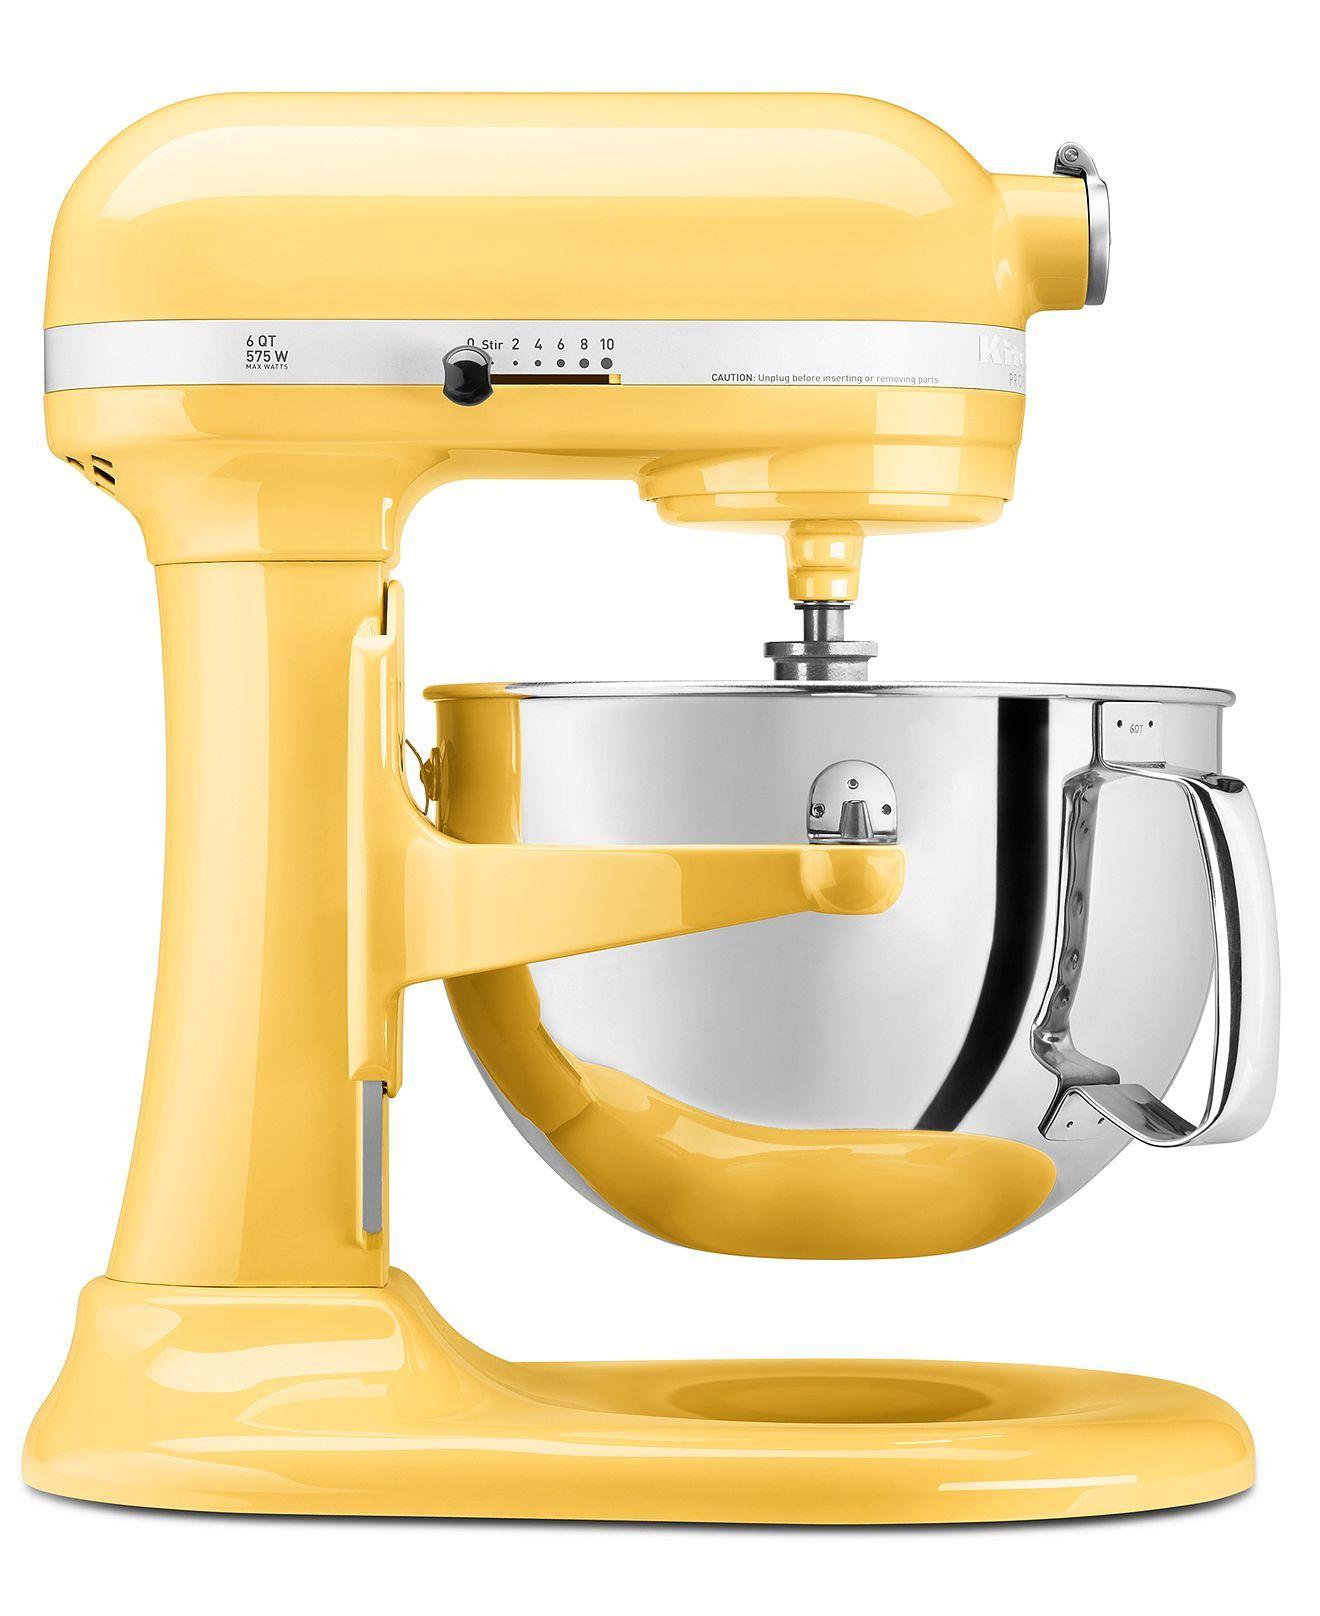 Macys Kitchen Aid Dining Room Sets Kitchenaid Kp26m1x Stand Mixer 6 Qt Professional 600 Mixers Attachments Macy S